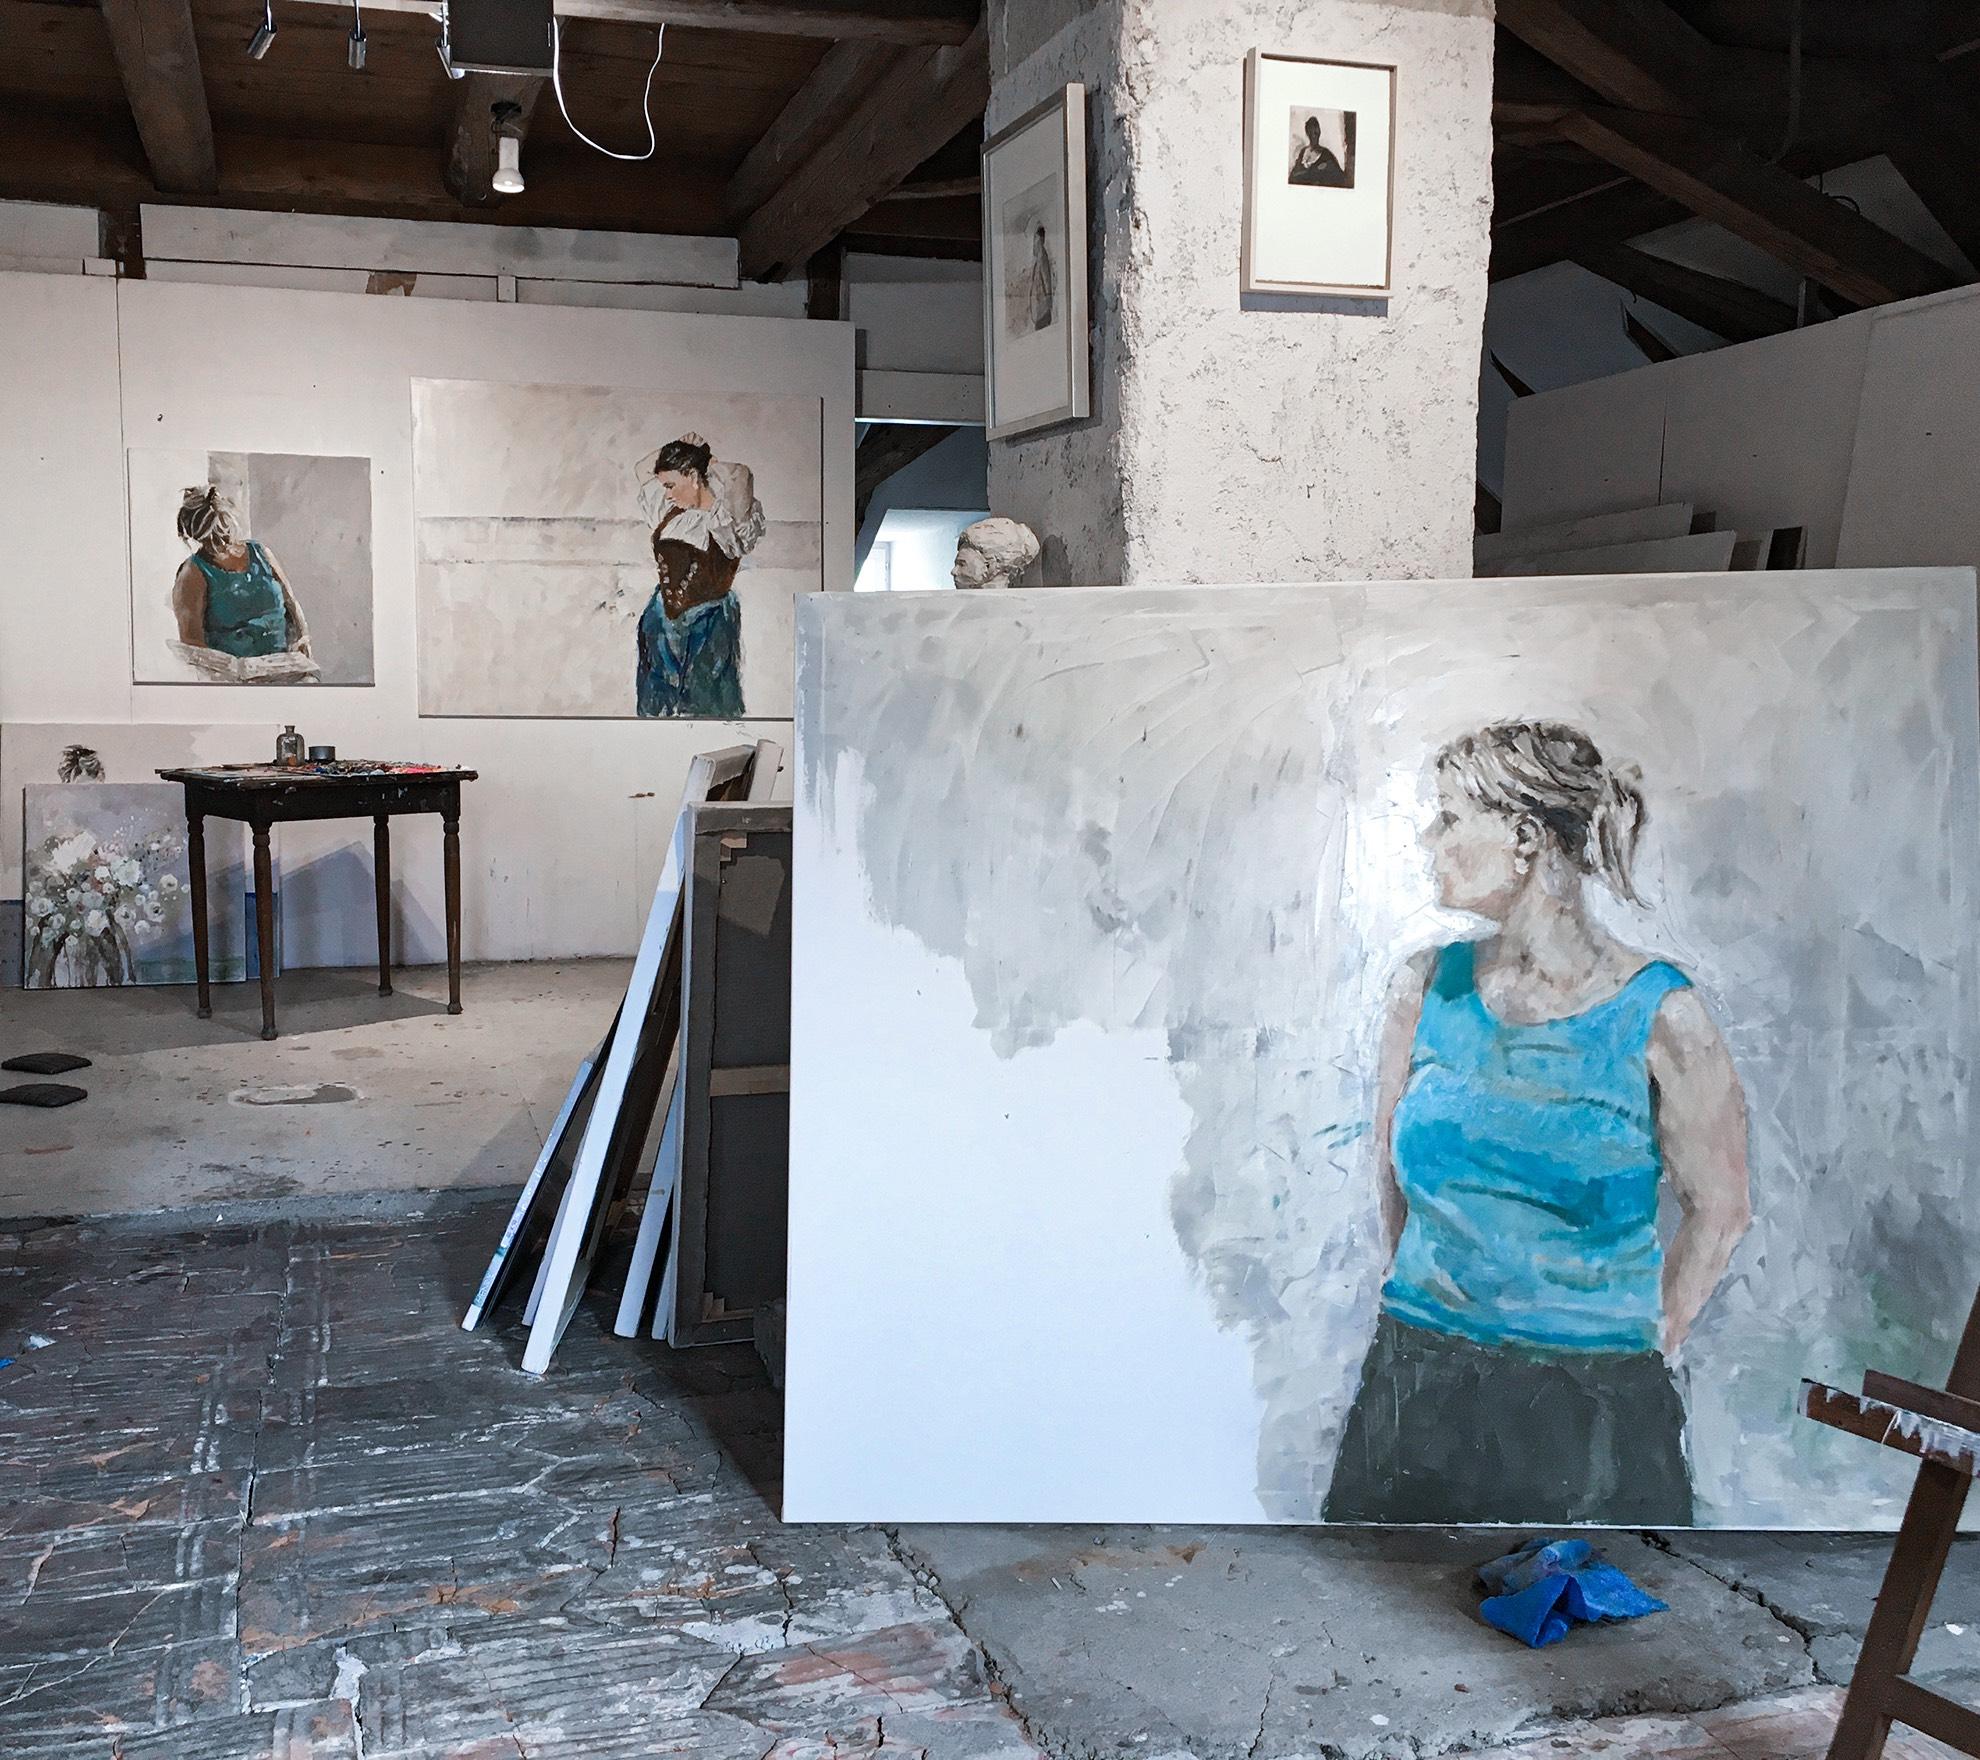 kunst-malerei-schweizer-kuenstler-stefan-werthmueller-cover-malerei